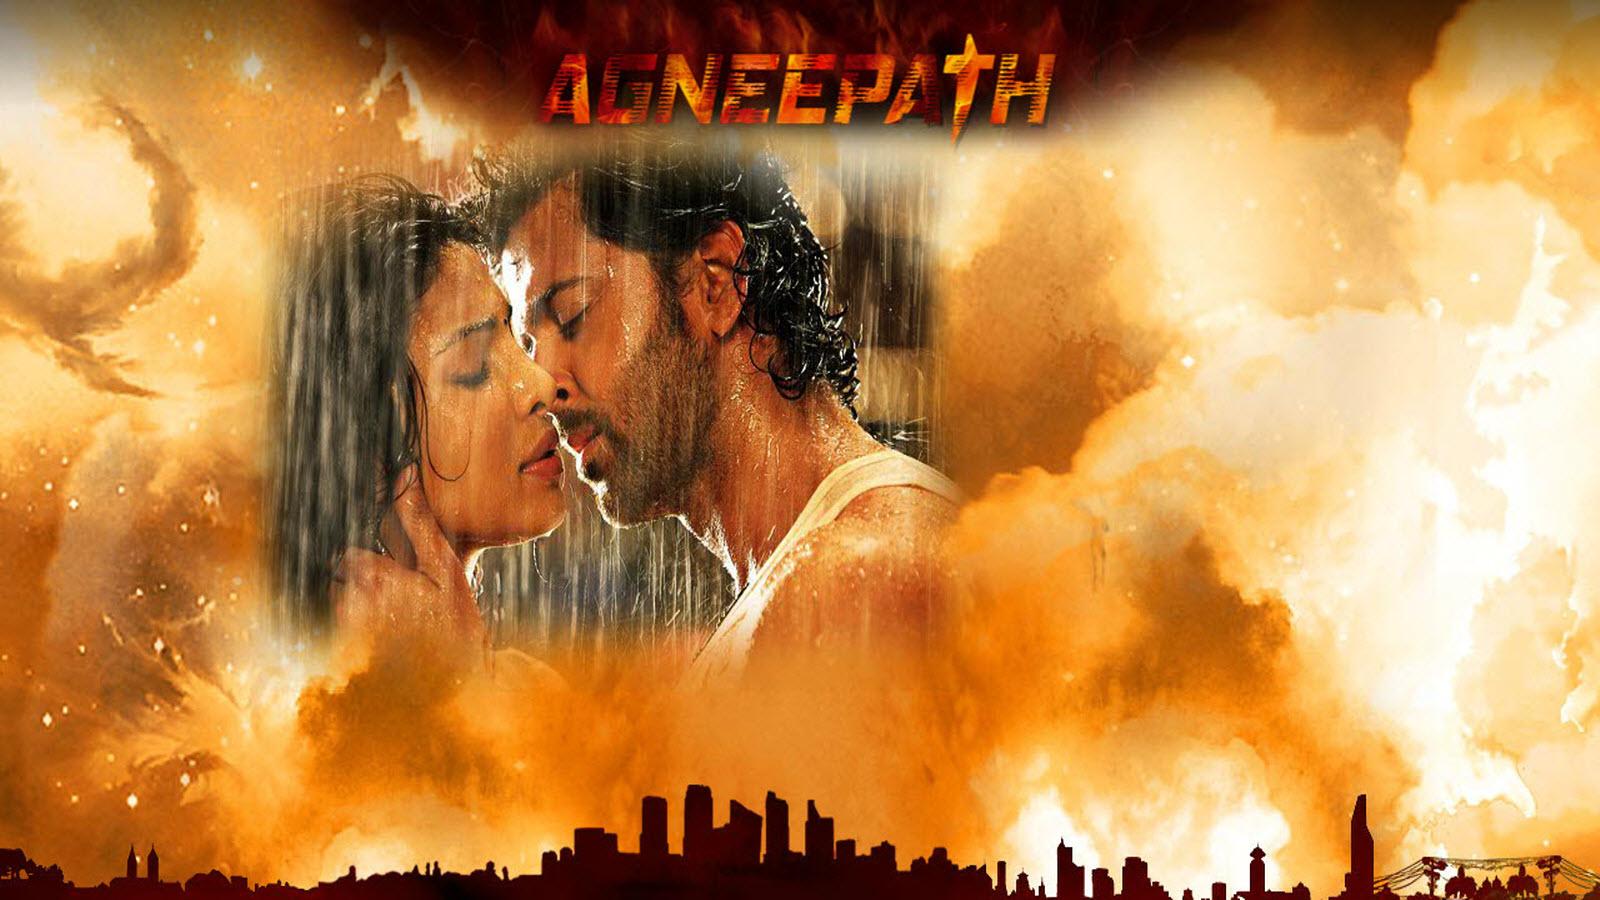 Agneepath Movie Download In Tamil